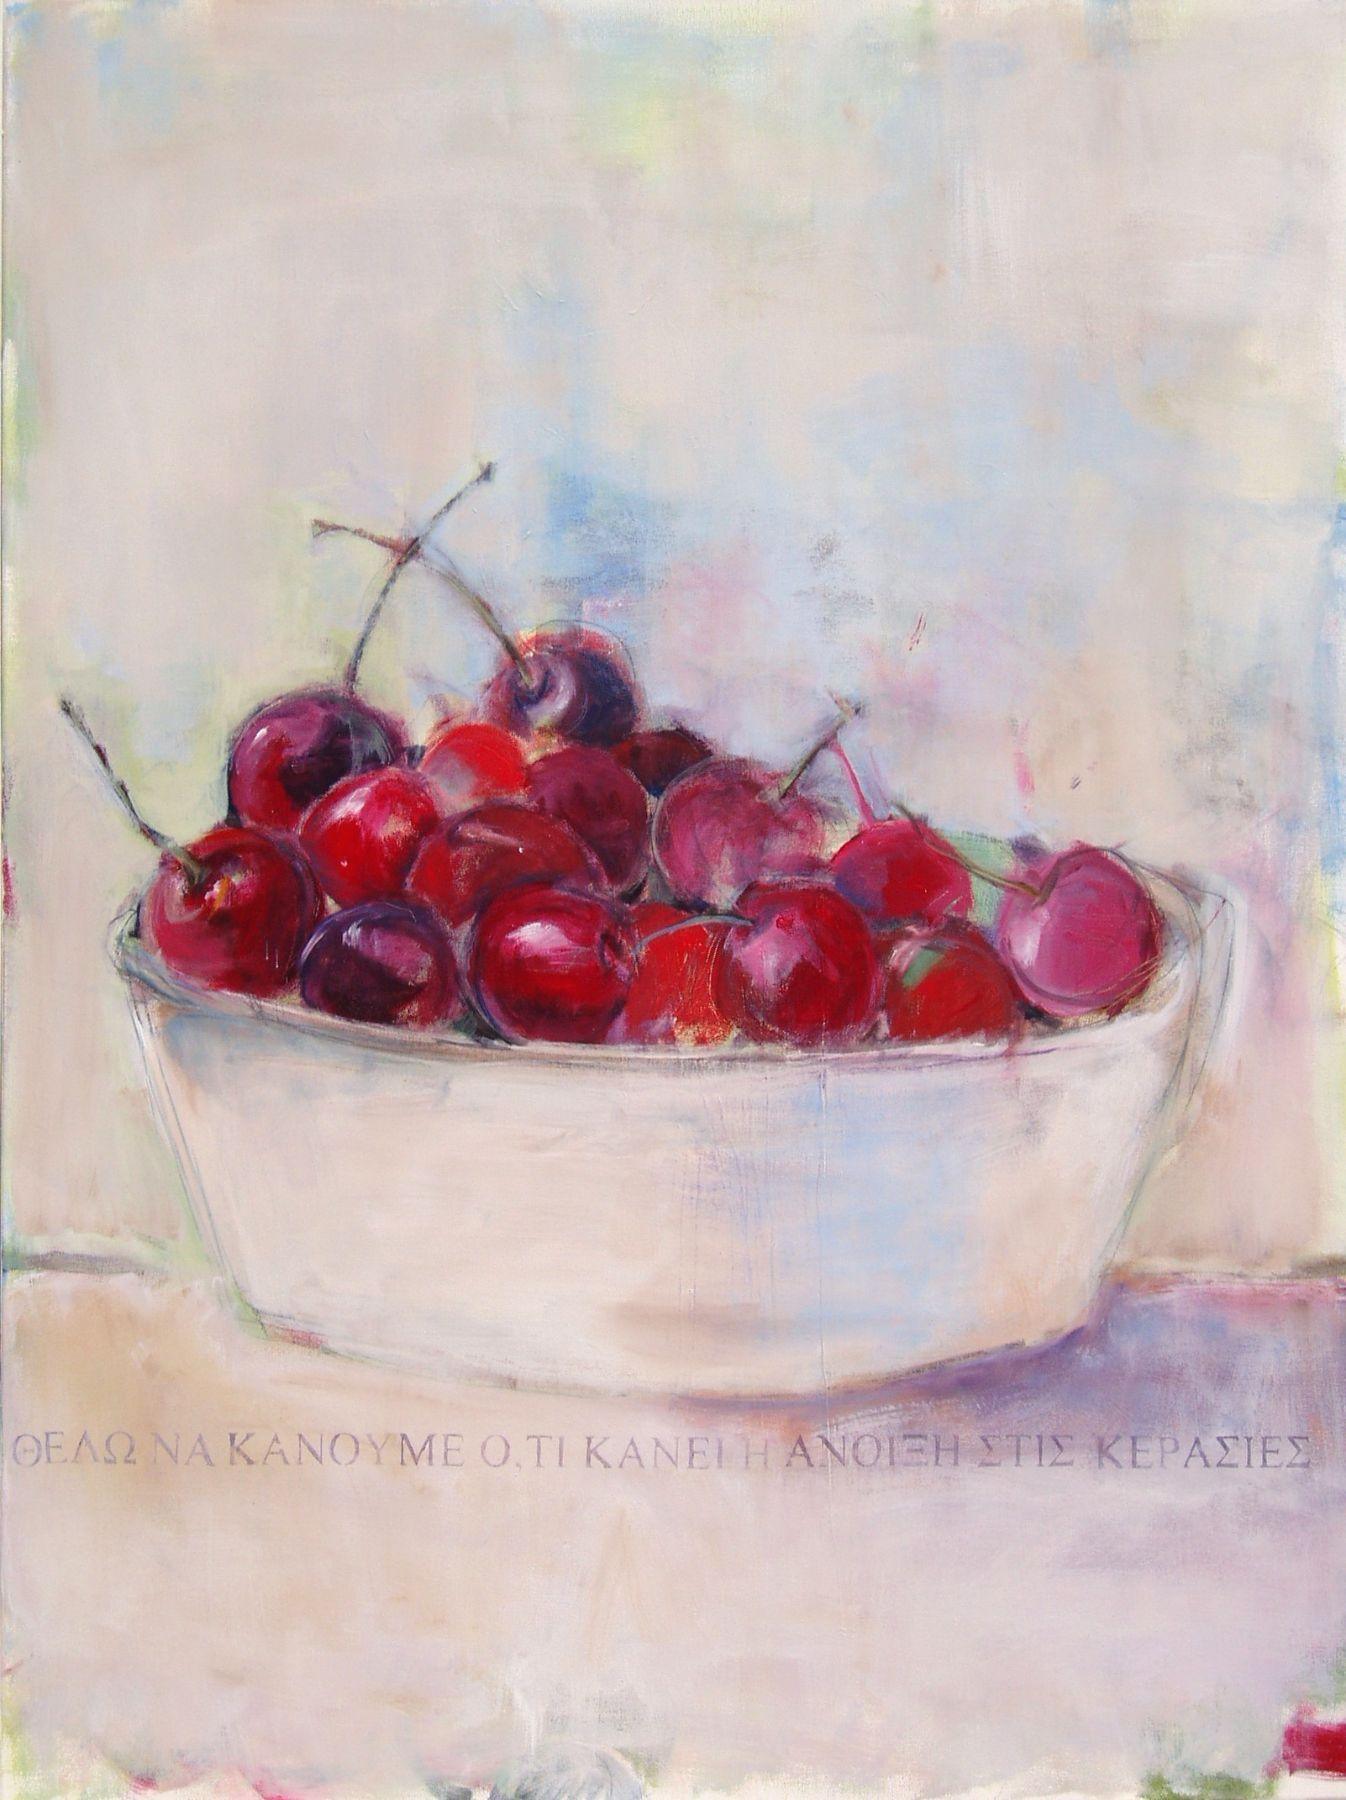 Cherries painting, acrylic on canvas by artist Neva Bergemann